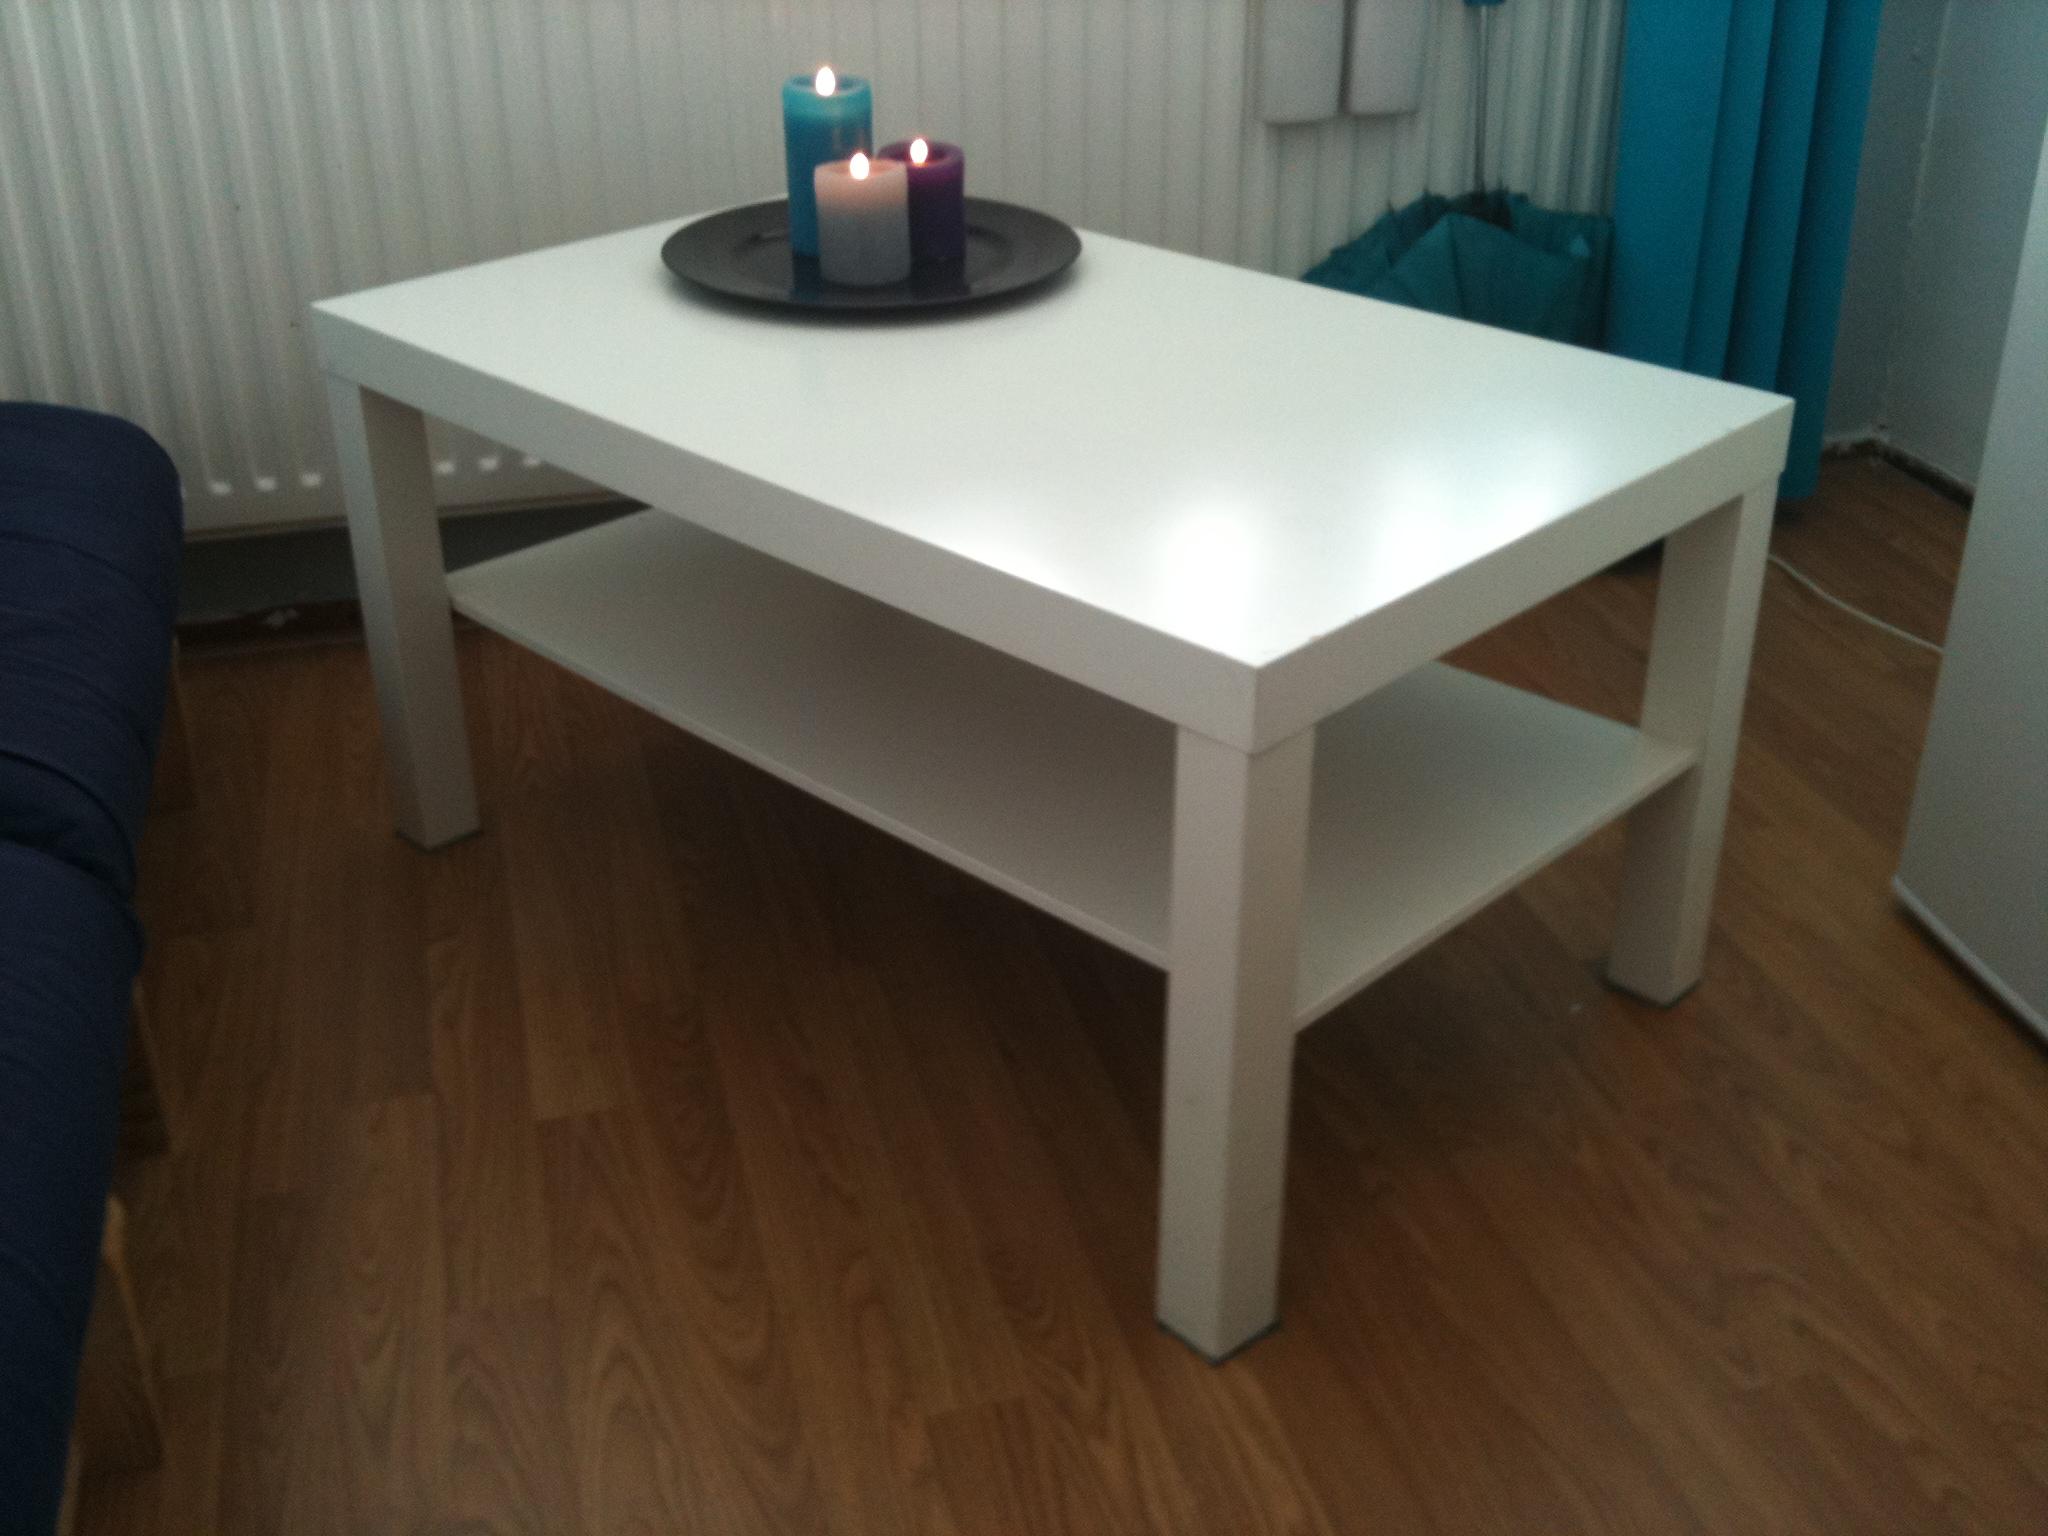 Ikea salontafel rond glas stockholm salontafel ikea source stockholm chair aud each ikea - Tafel stockholm huis ter wereld ...